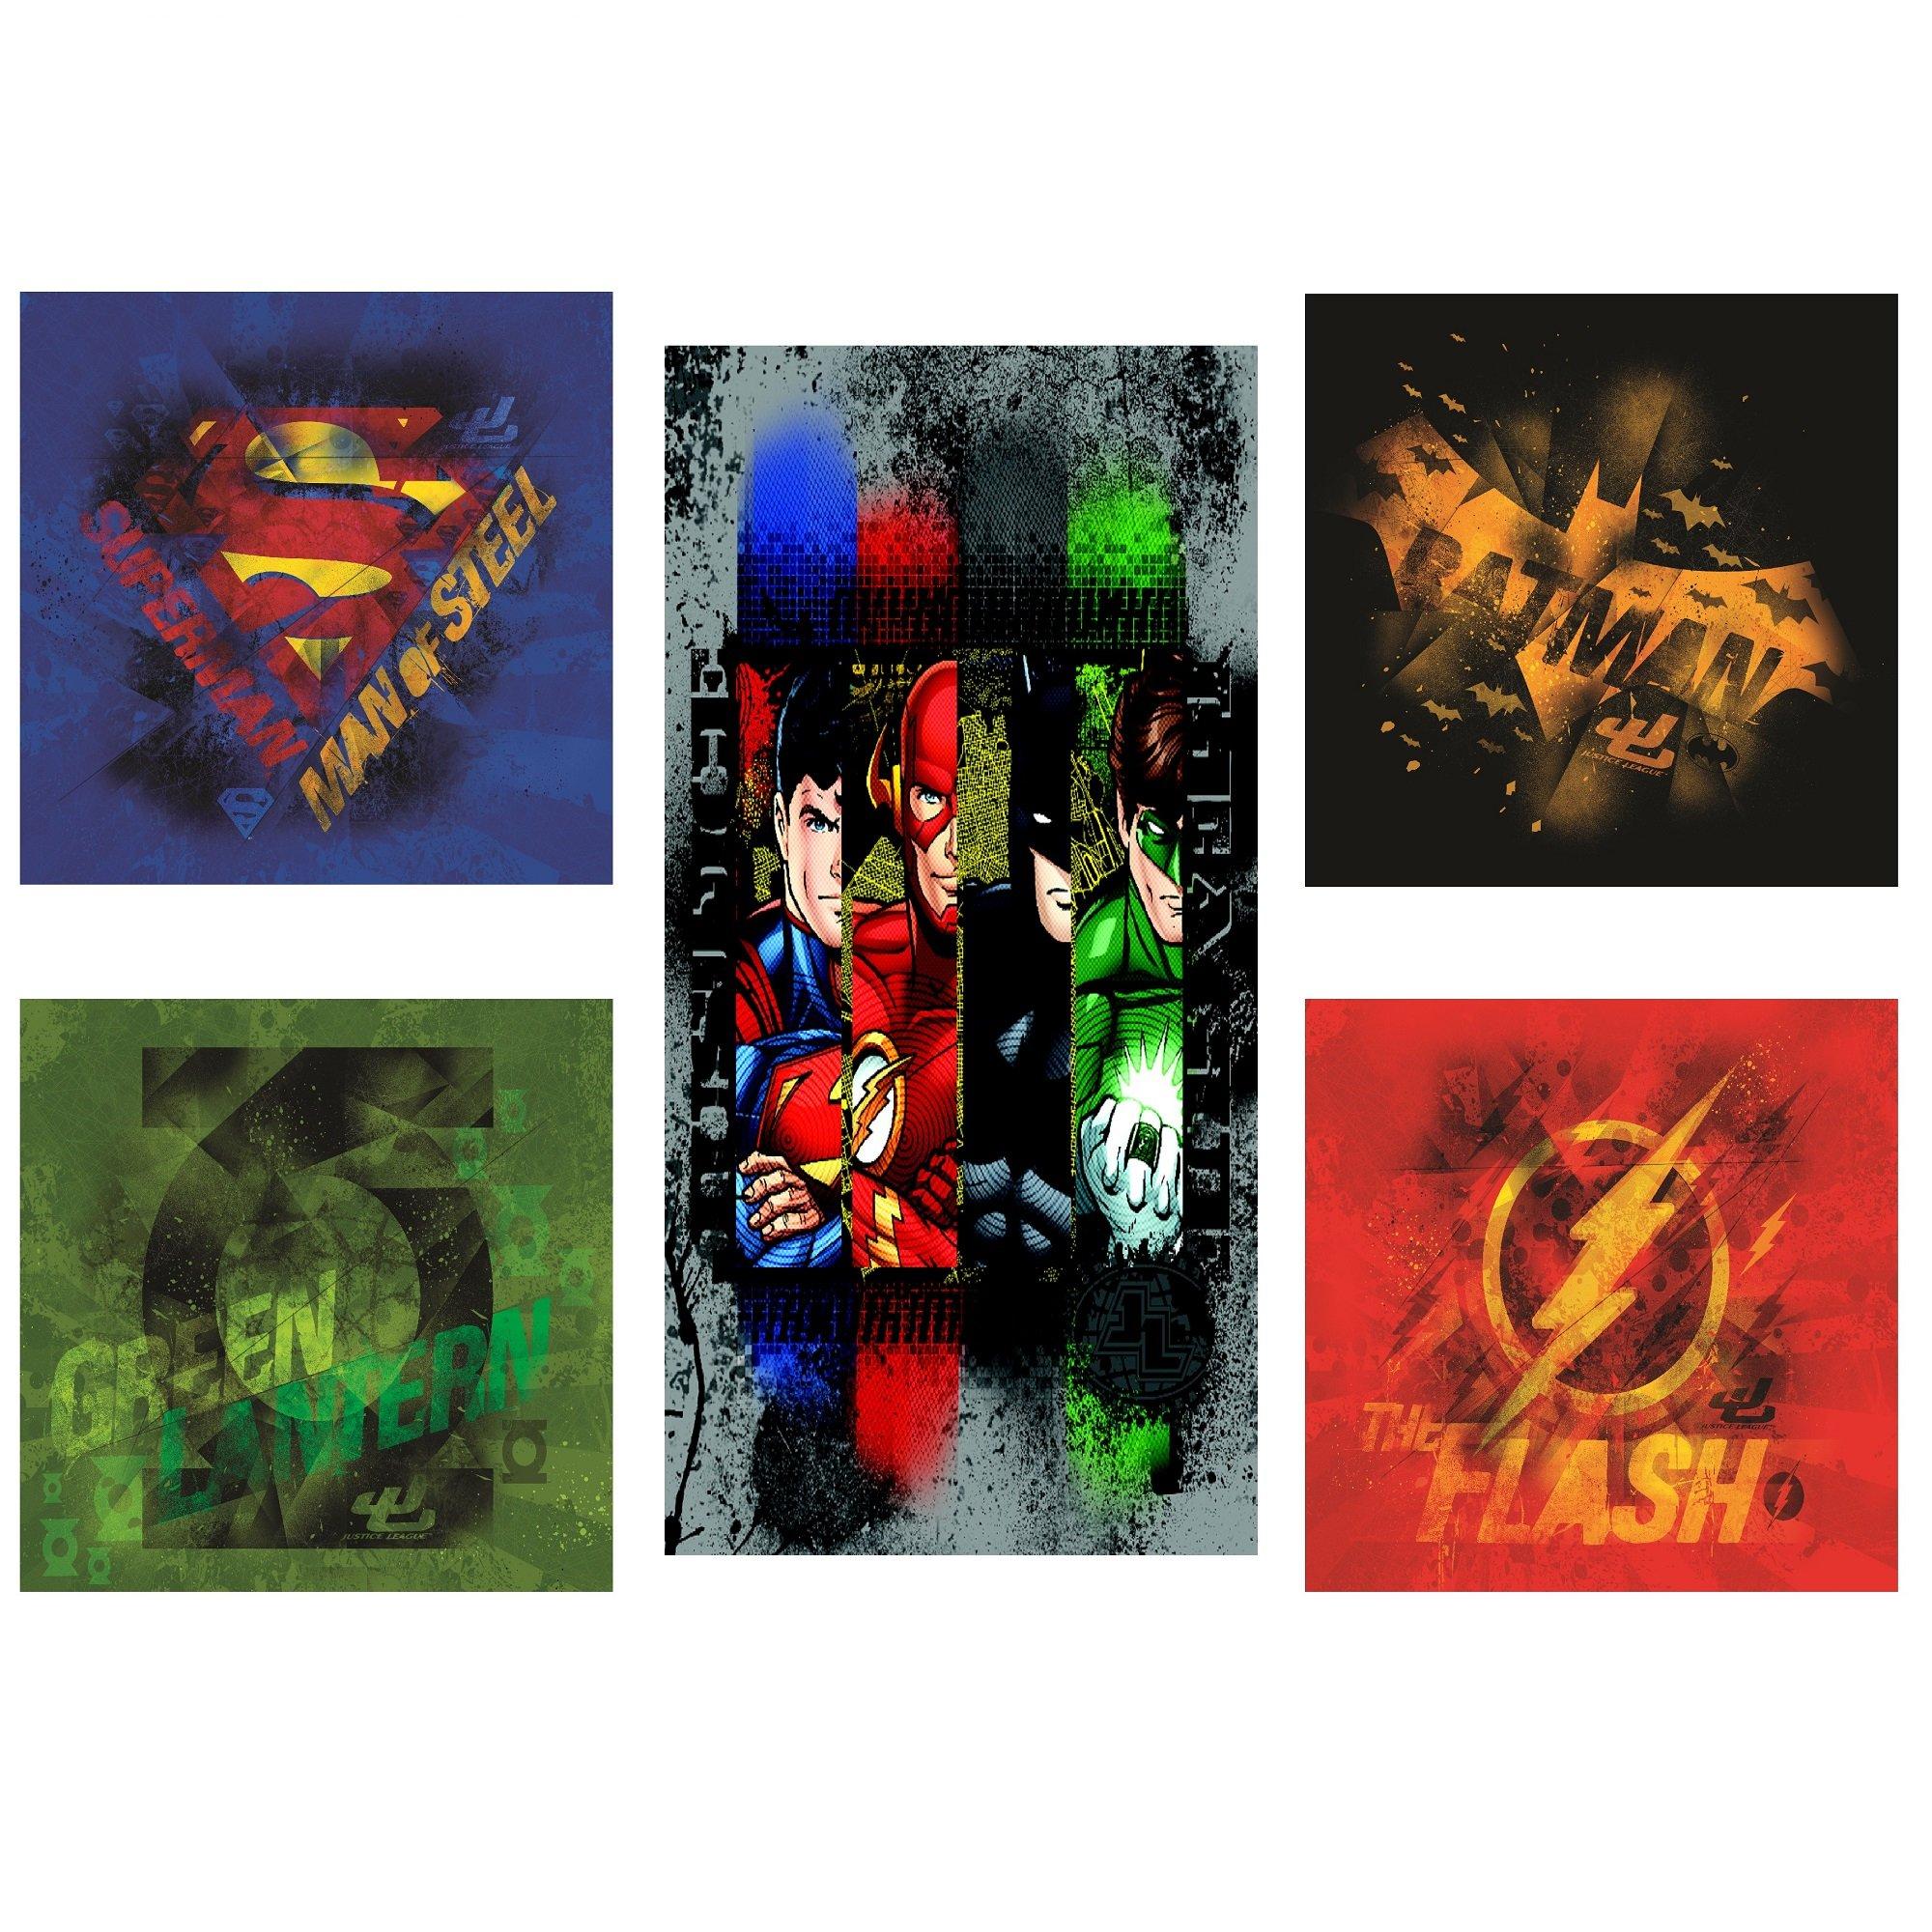 Modern Littles Justice League 5 Piece Canvas Wall Art Set Featuring Superhero Character Designs of Superman, Batman, Green Lantern and Flash Gordon, Multicolored by Modern Littles (Image #1)